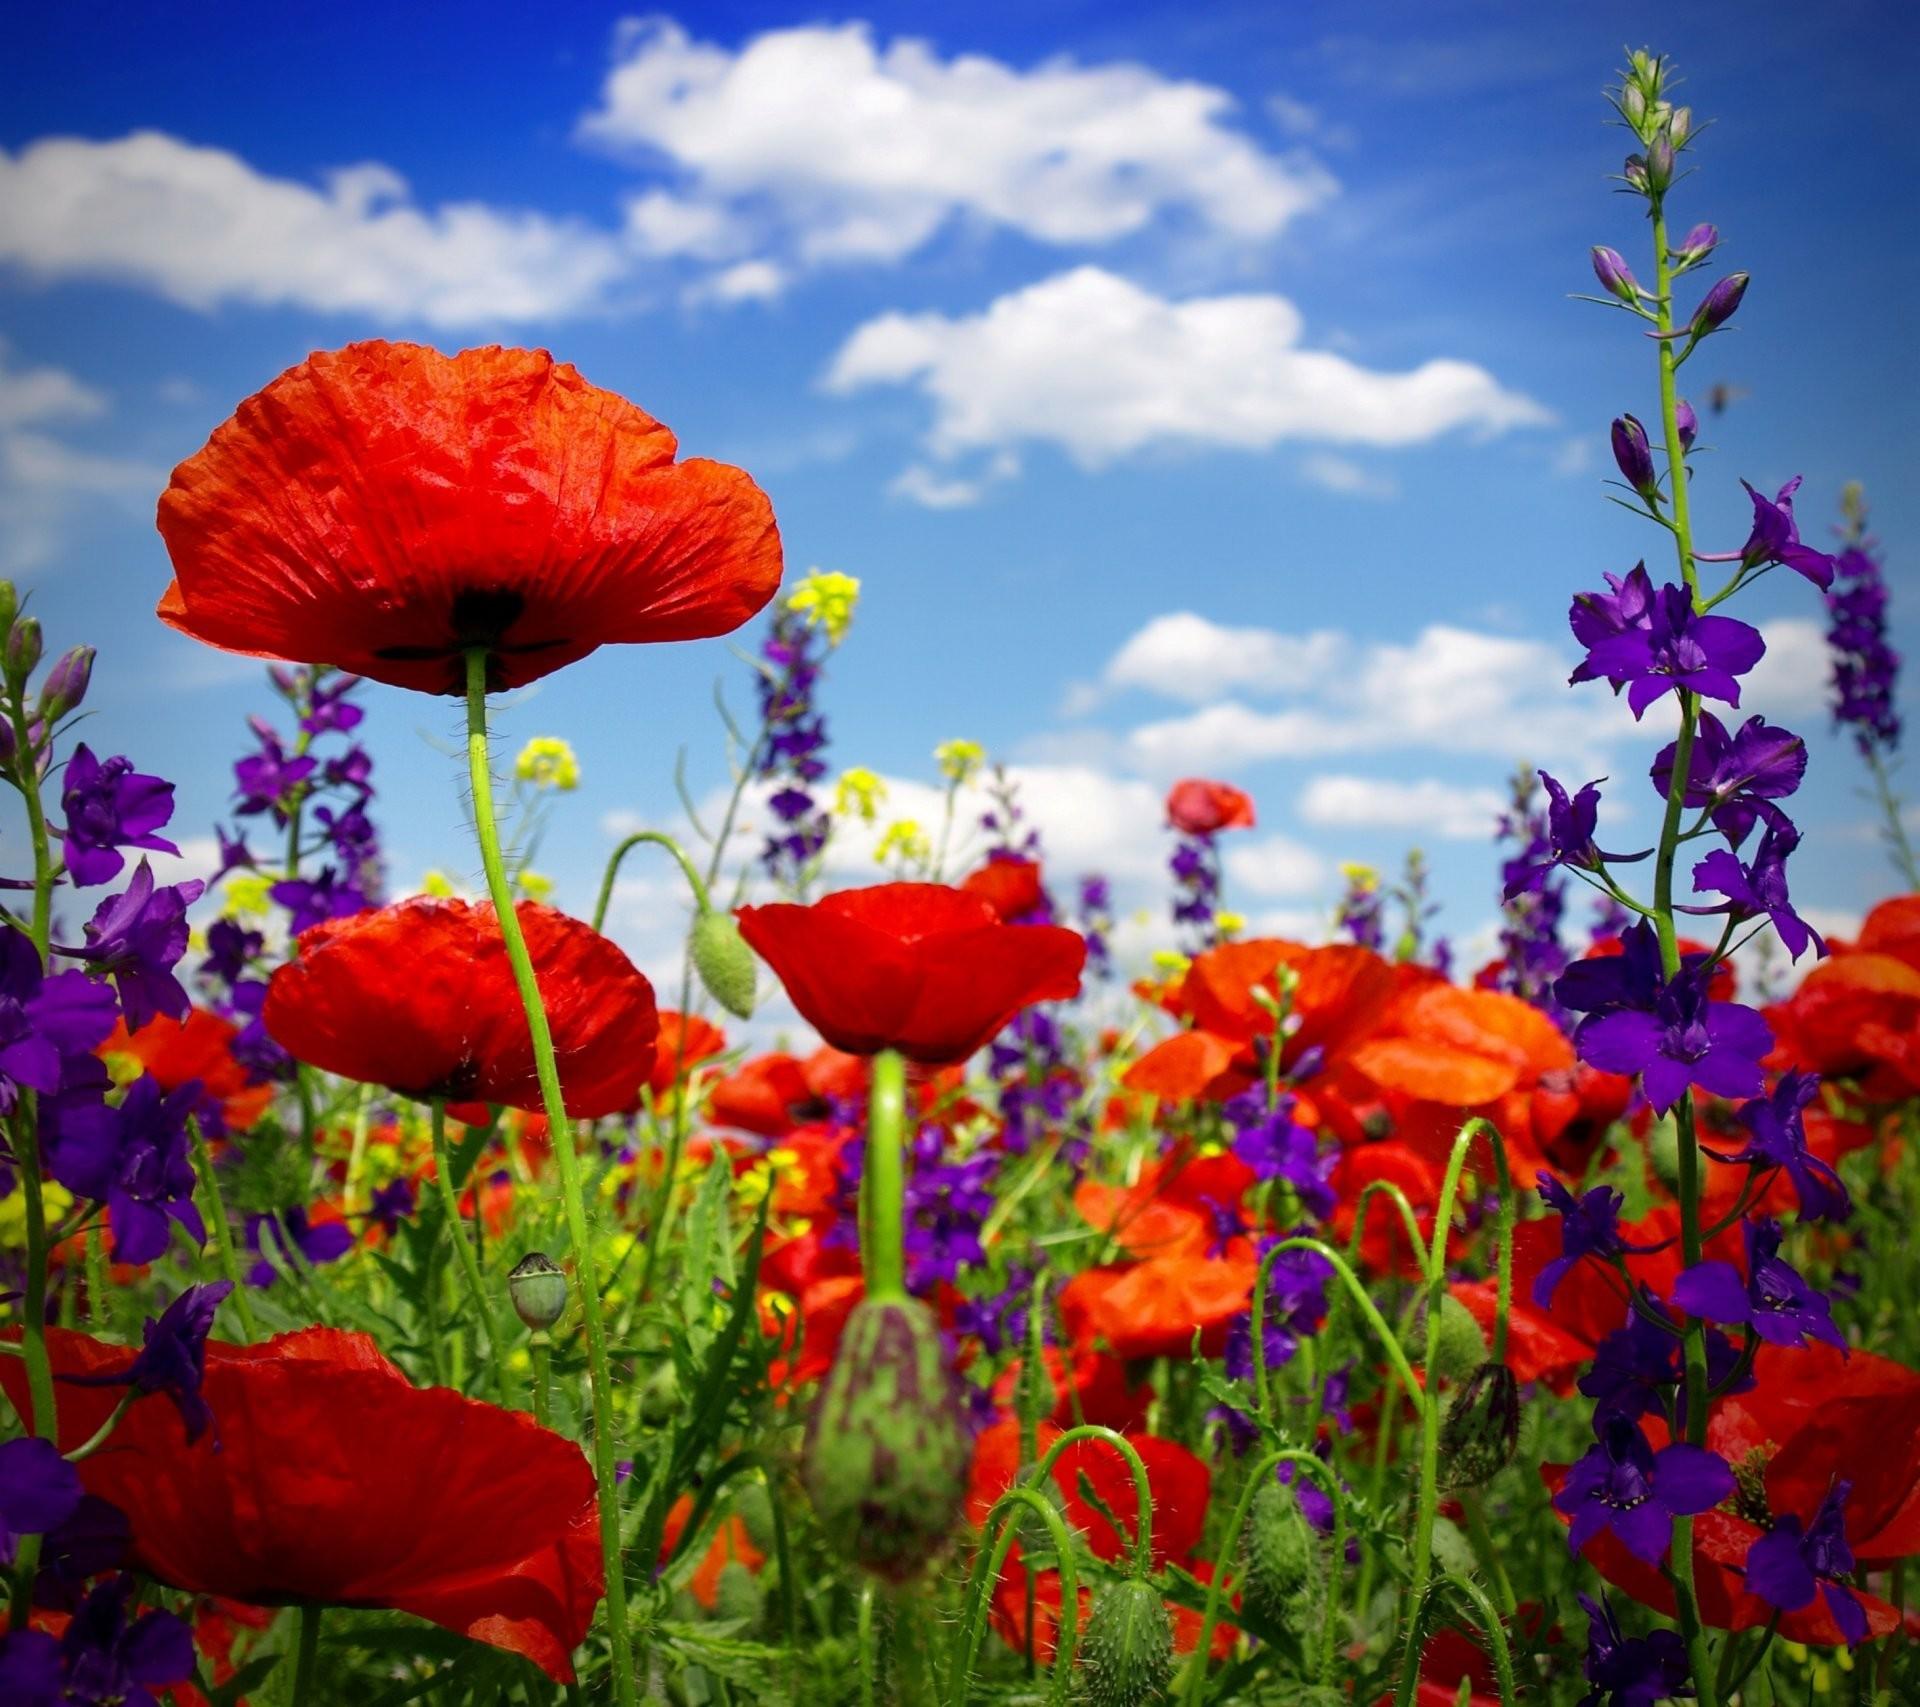 Poppy Flower Wallpaper 62 Pictures